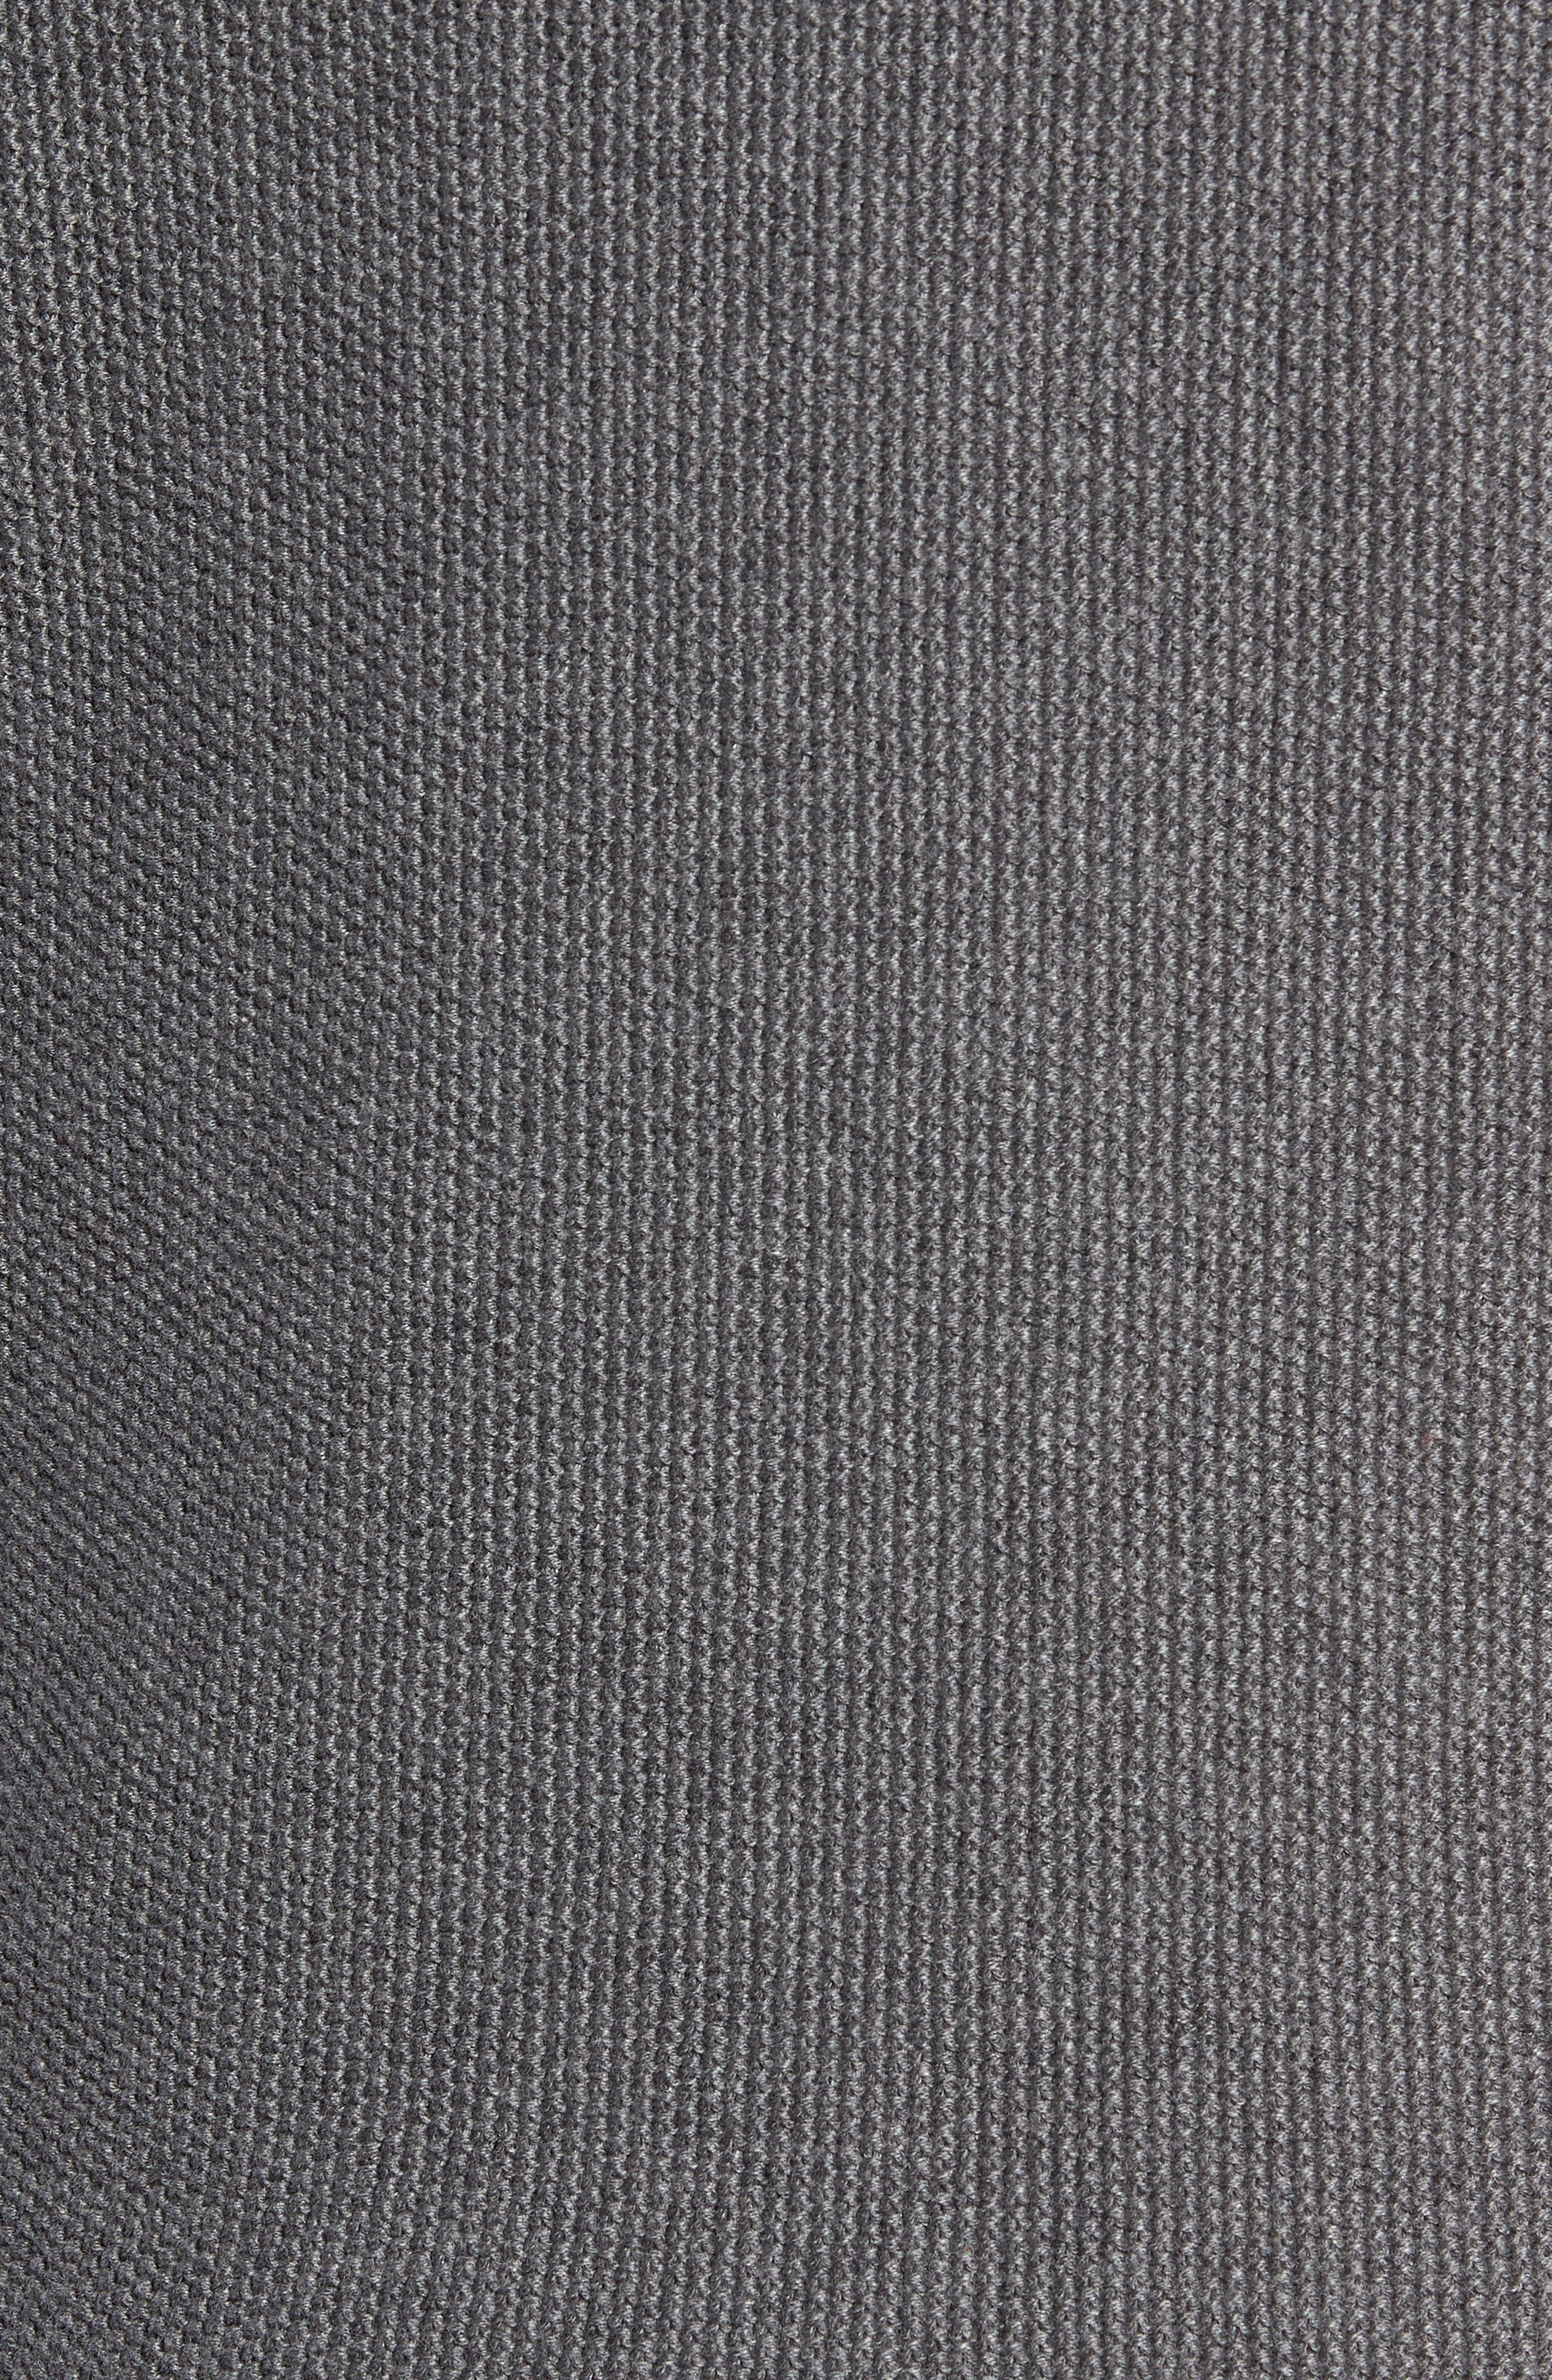 Owl Textured Sweater,                             Alternate thumbnail 5, color,                             GREY MELANGE